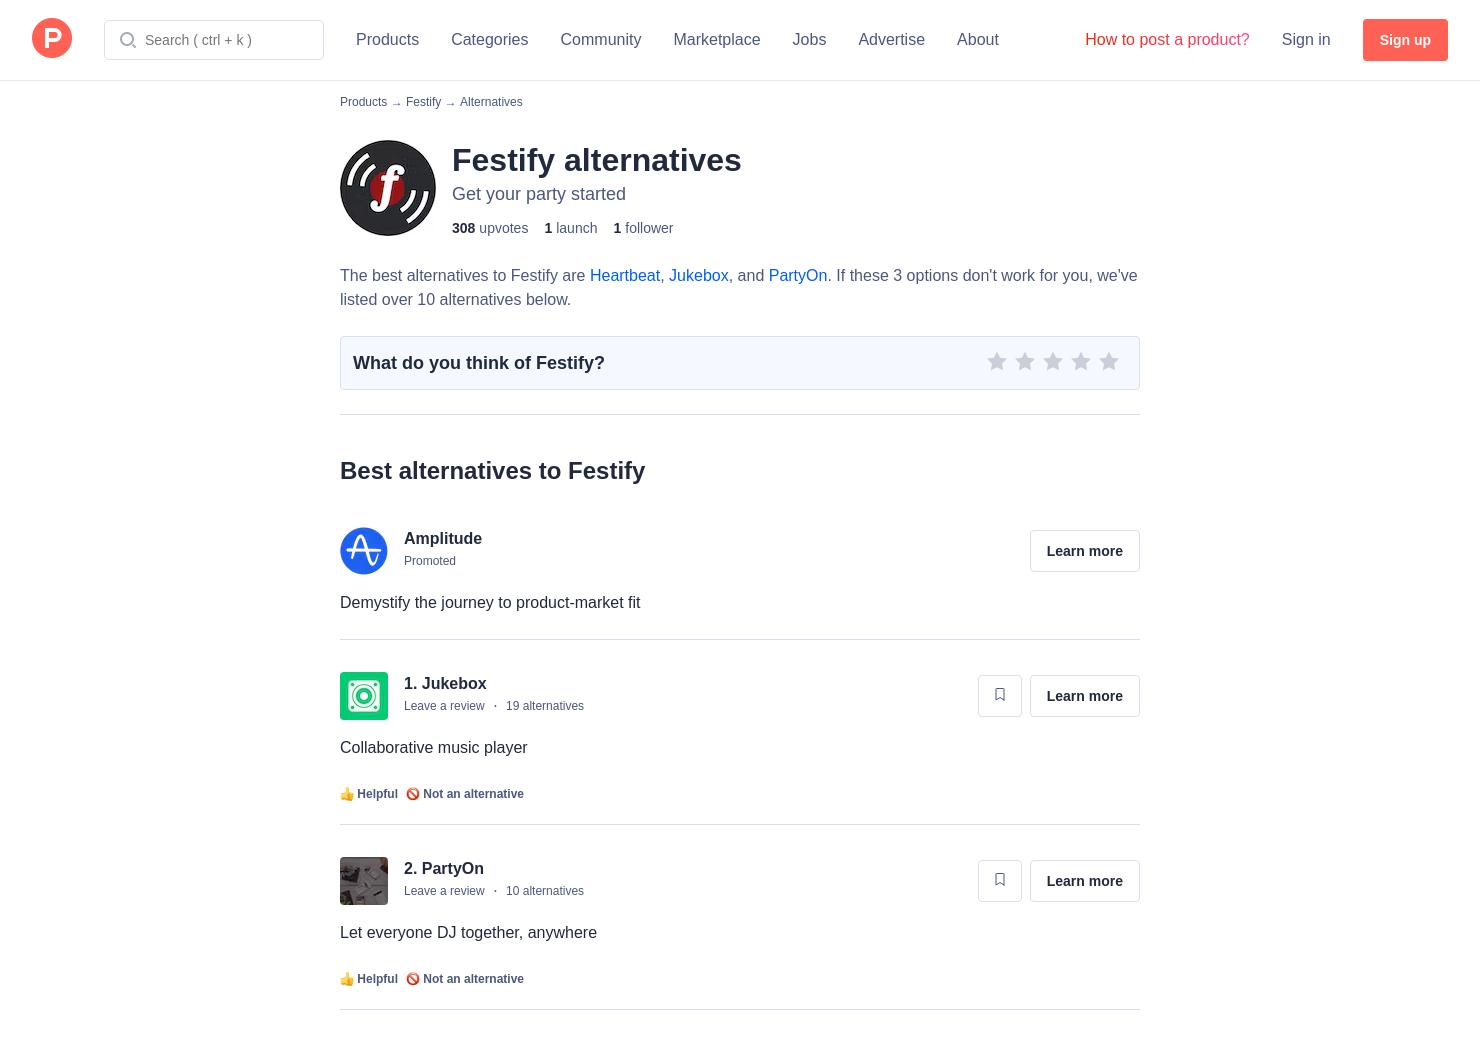 11 Alternatives to Festify | Product Hunt